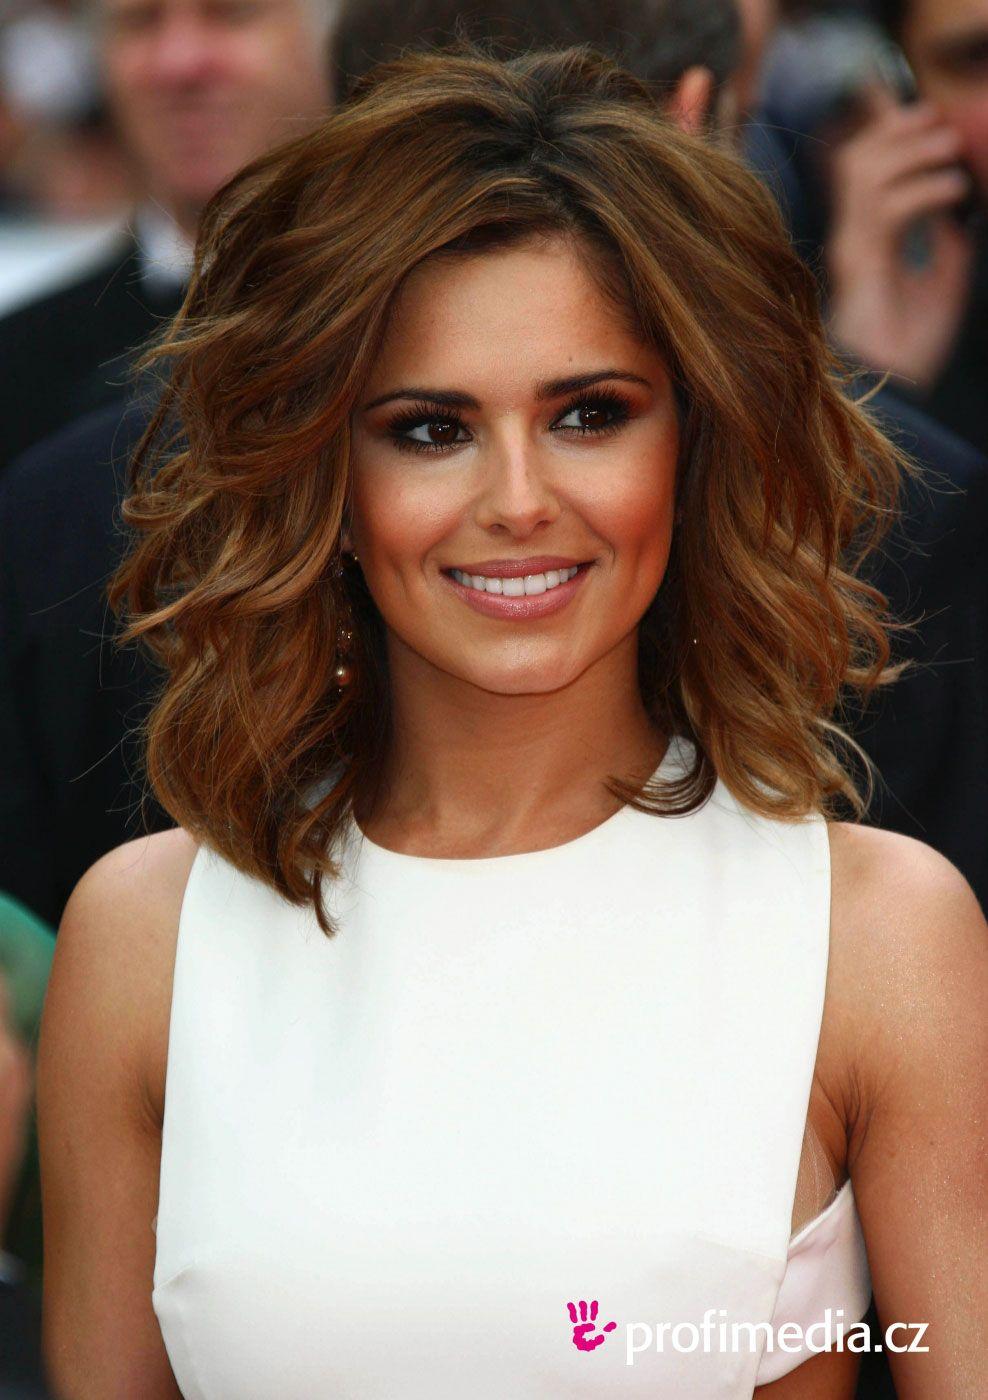 Cheryl Cole Hairstyle Easyhairstyler Cheryl Cole Hair Human Hair Wigs Celebrity Hairstyles